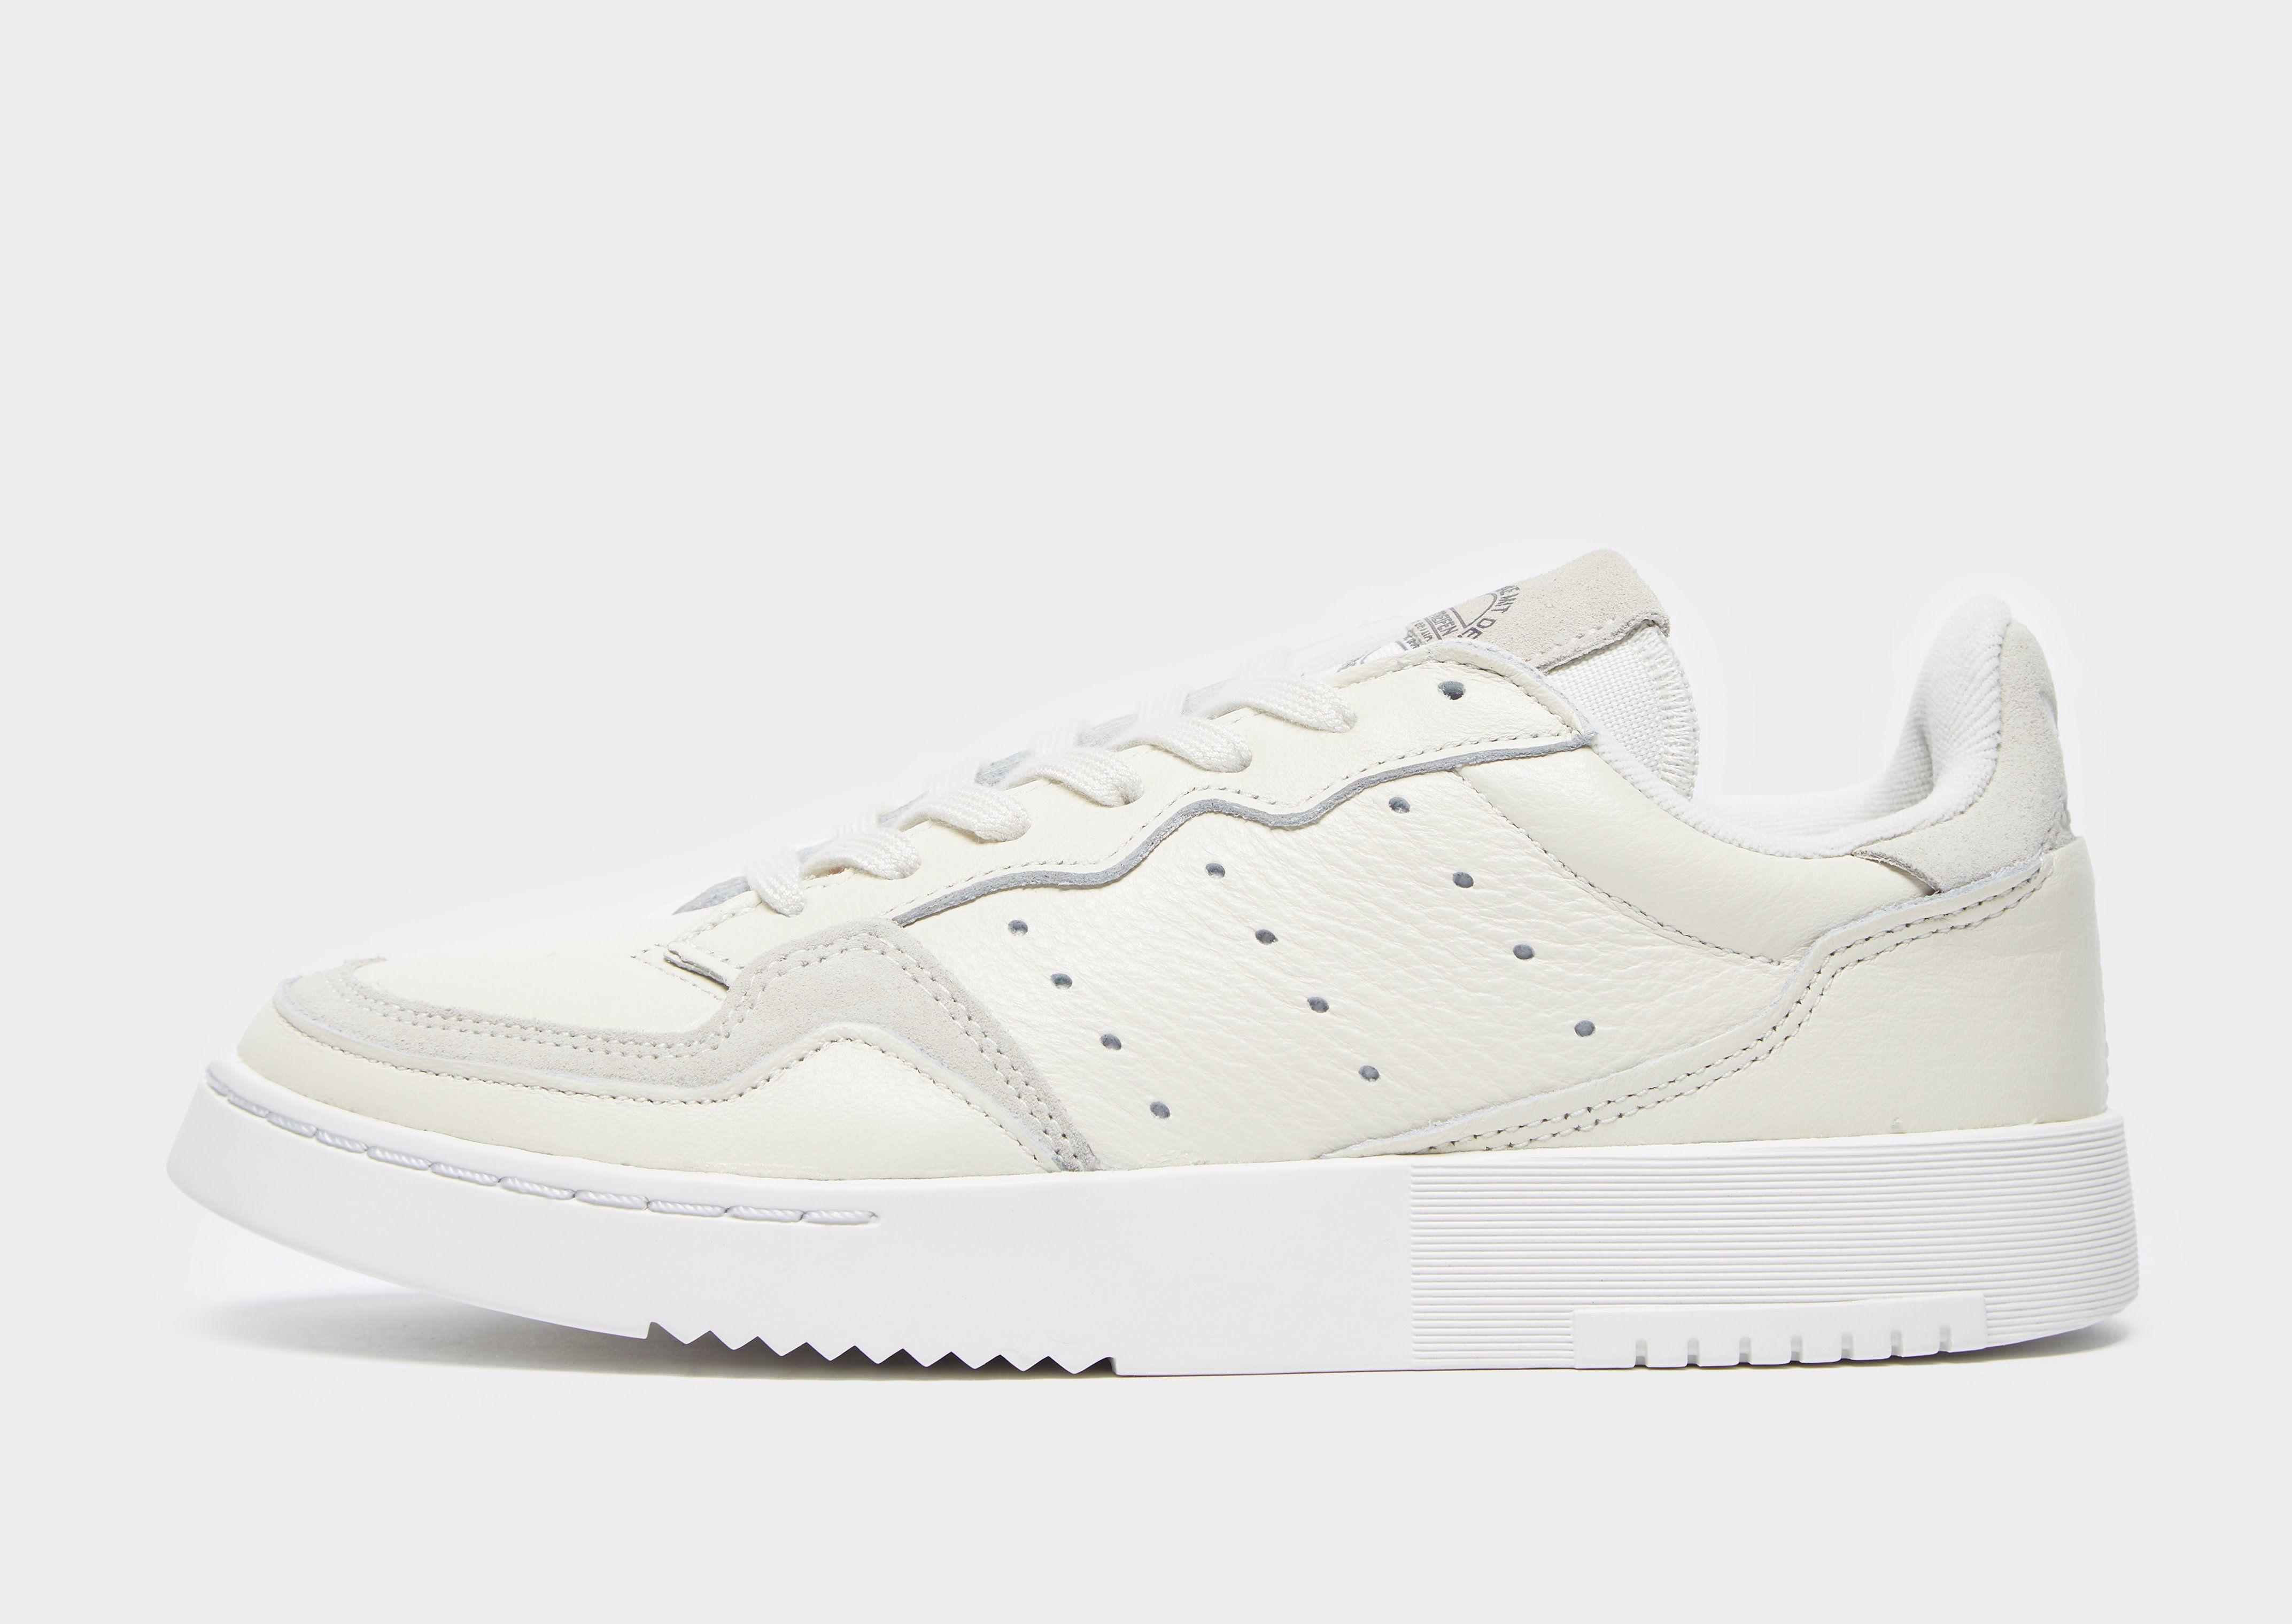 c0bee5e9 adidas Originals Supercourt Shoes | JD Sports